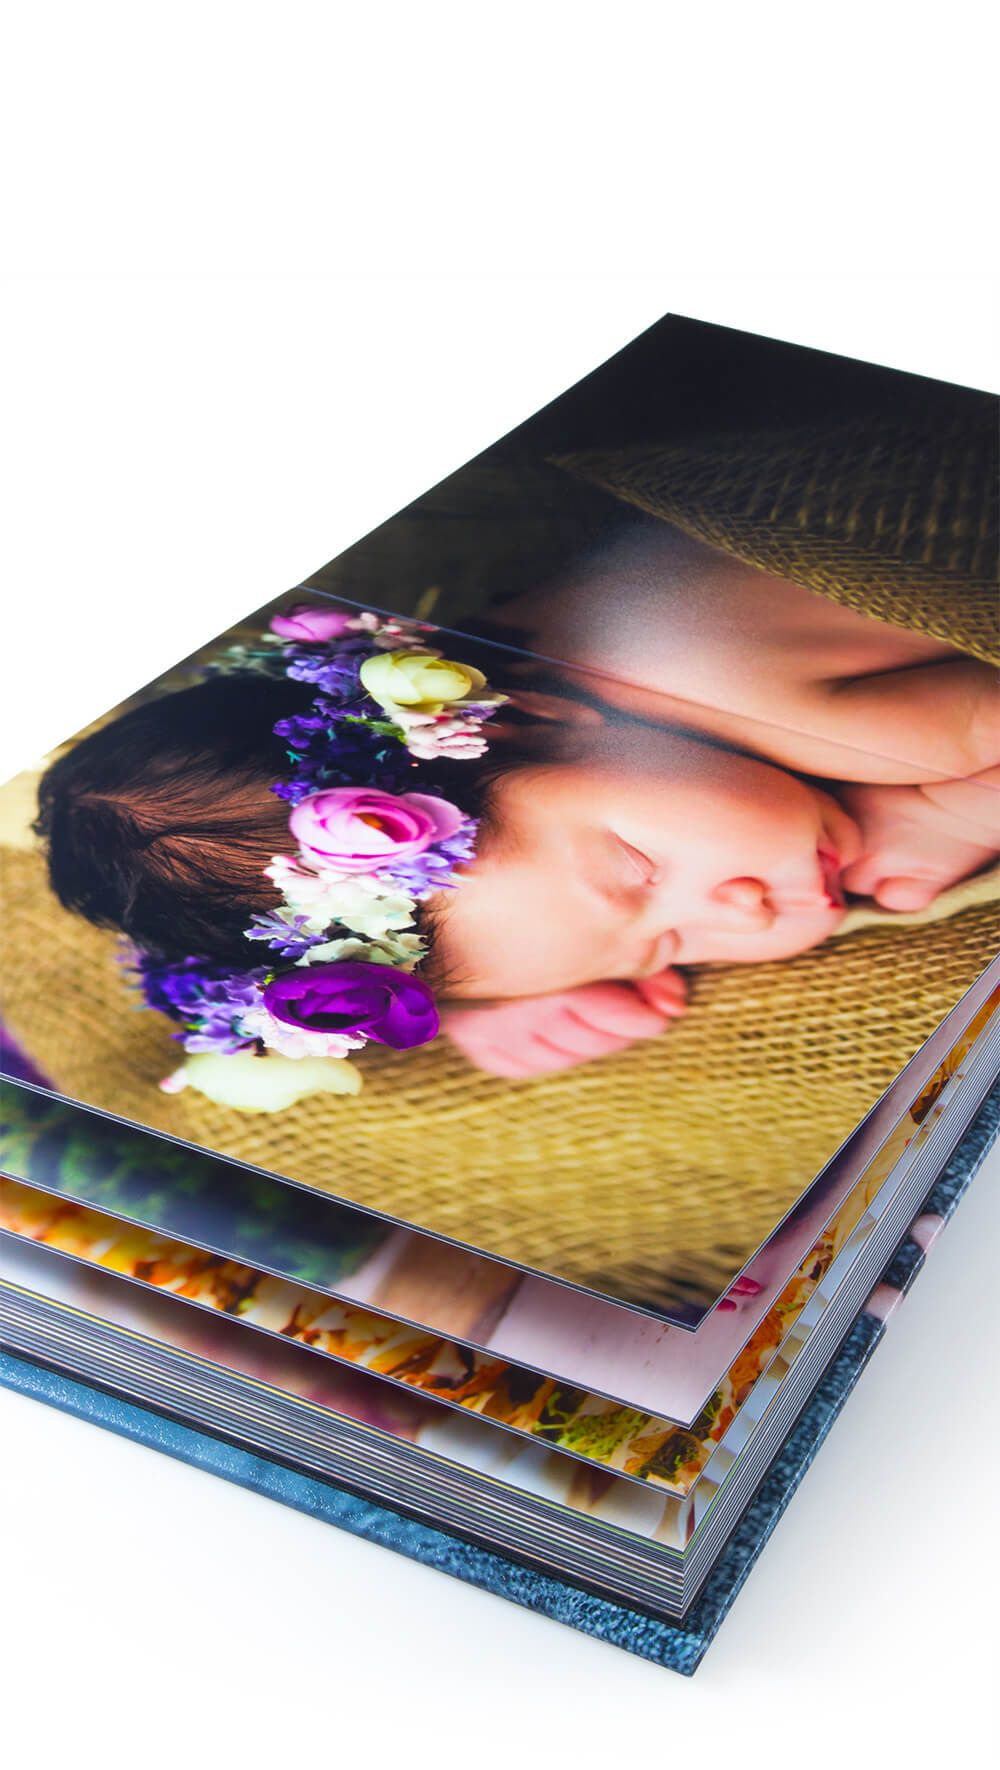 5 trial for 30 book sh zno flush mount albums photo book 5 trial for 30 book sh zno flush mount albums photo book solutioingenieria Image collections